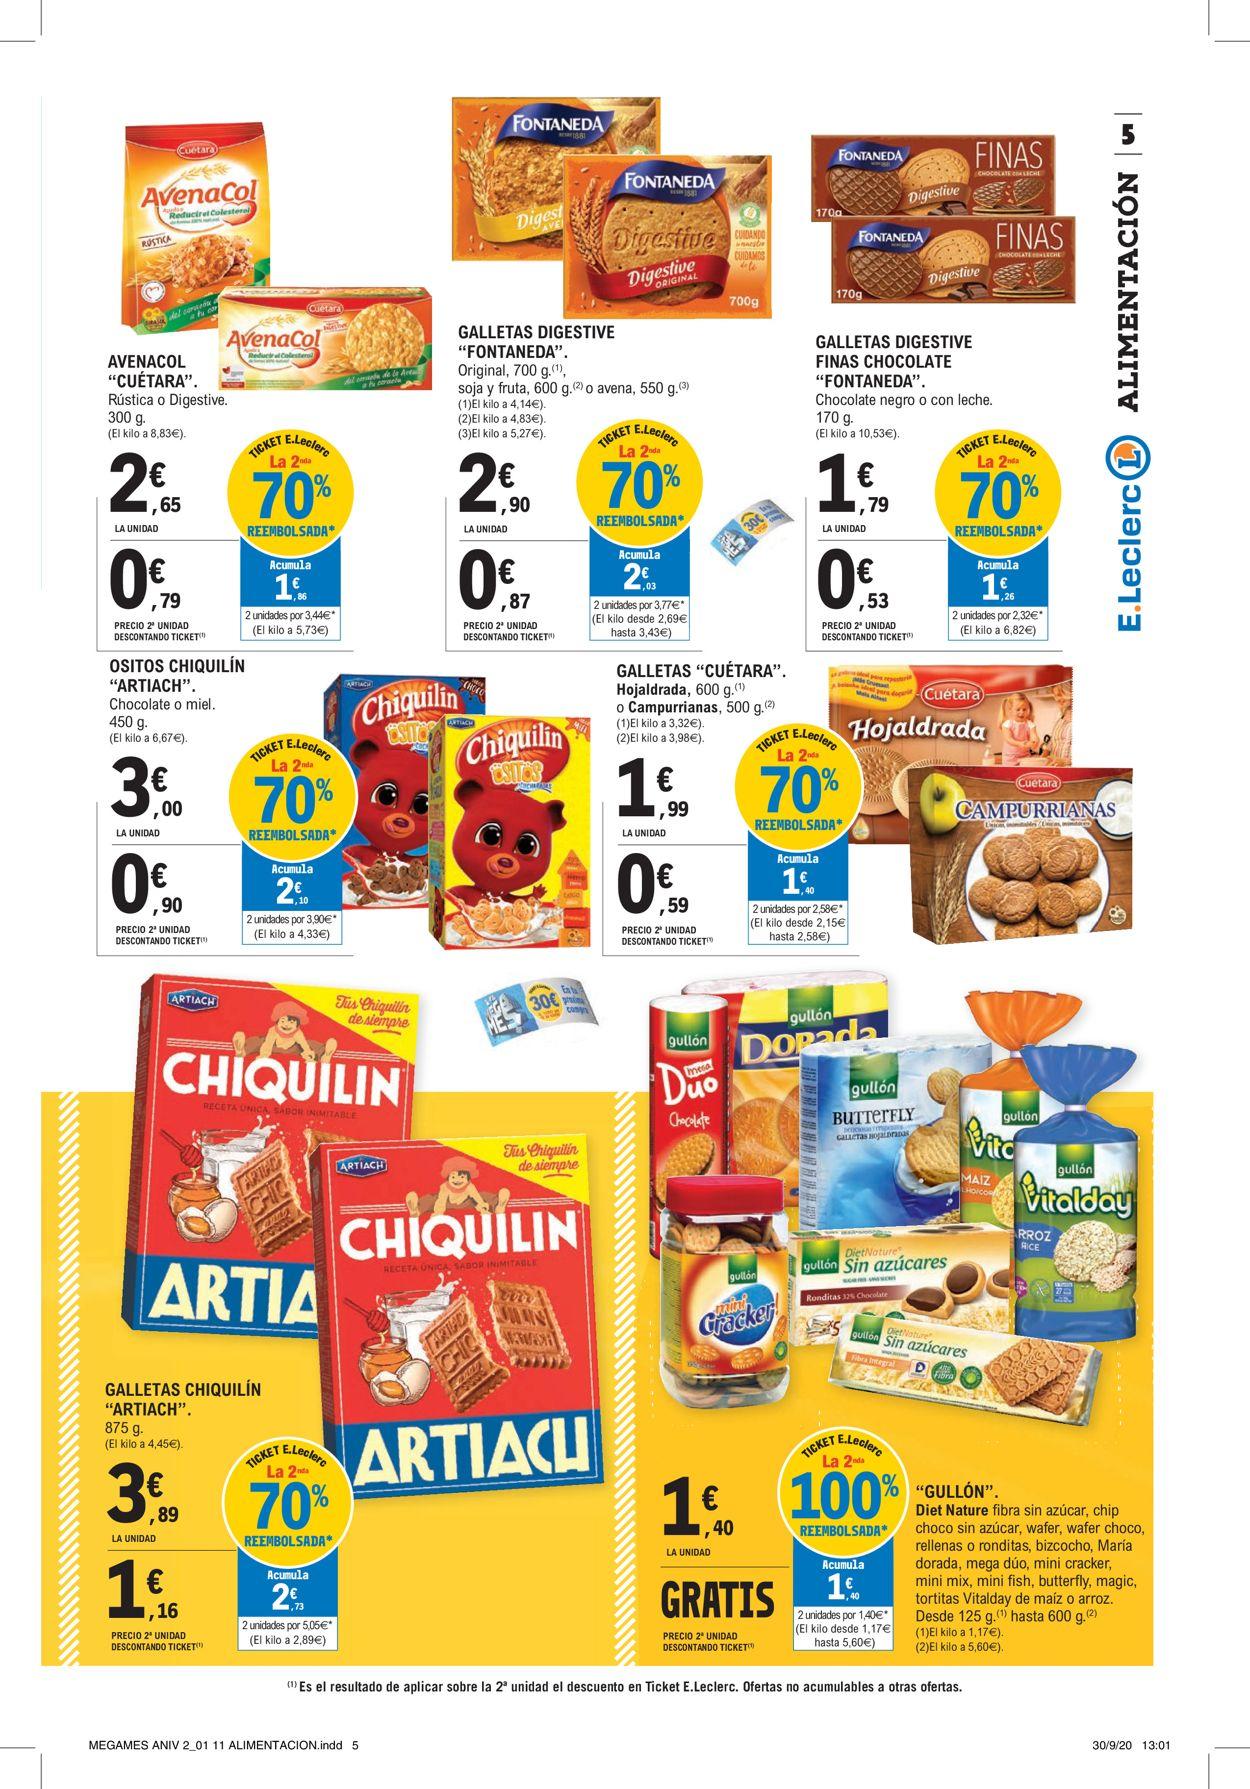 E.leclerc Folleto - 12.10-25.10.2020 (Página 5)